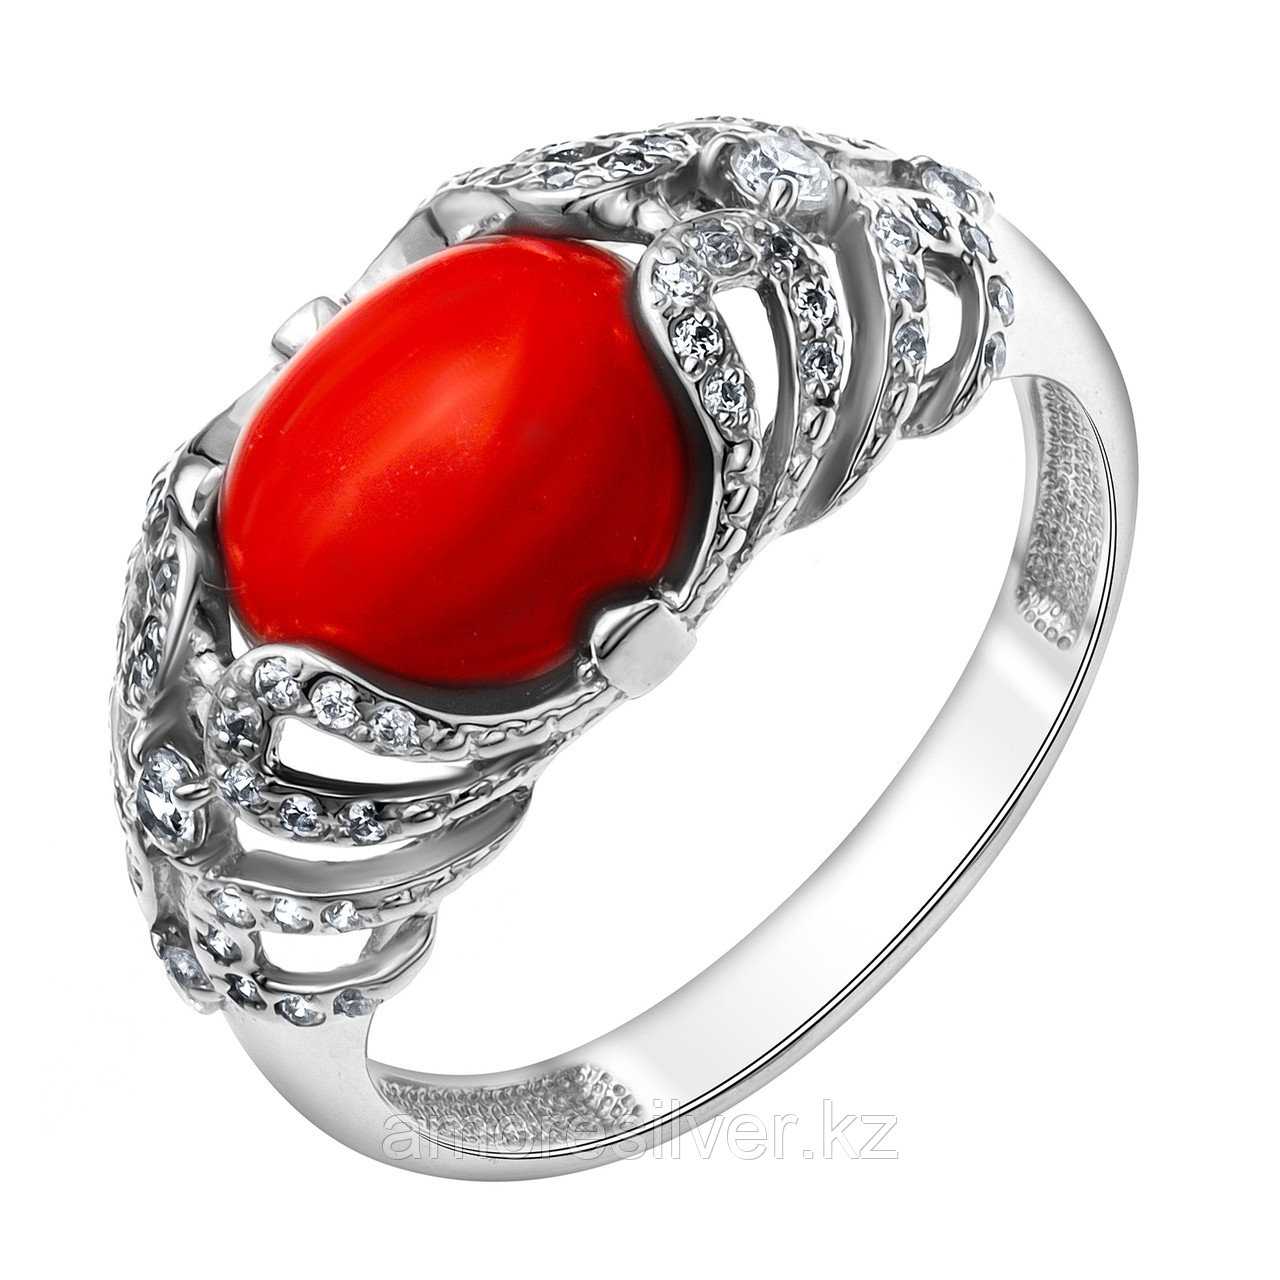 Серебряное кольцо с кораллом MASKOM 18  1000-0208-CRL-r